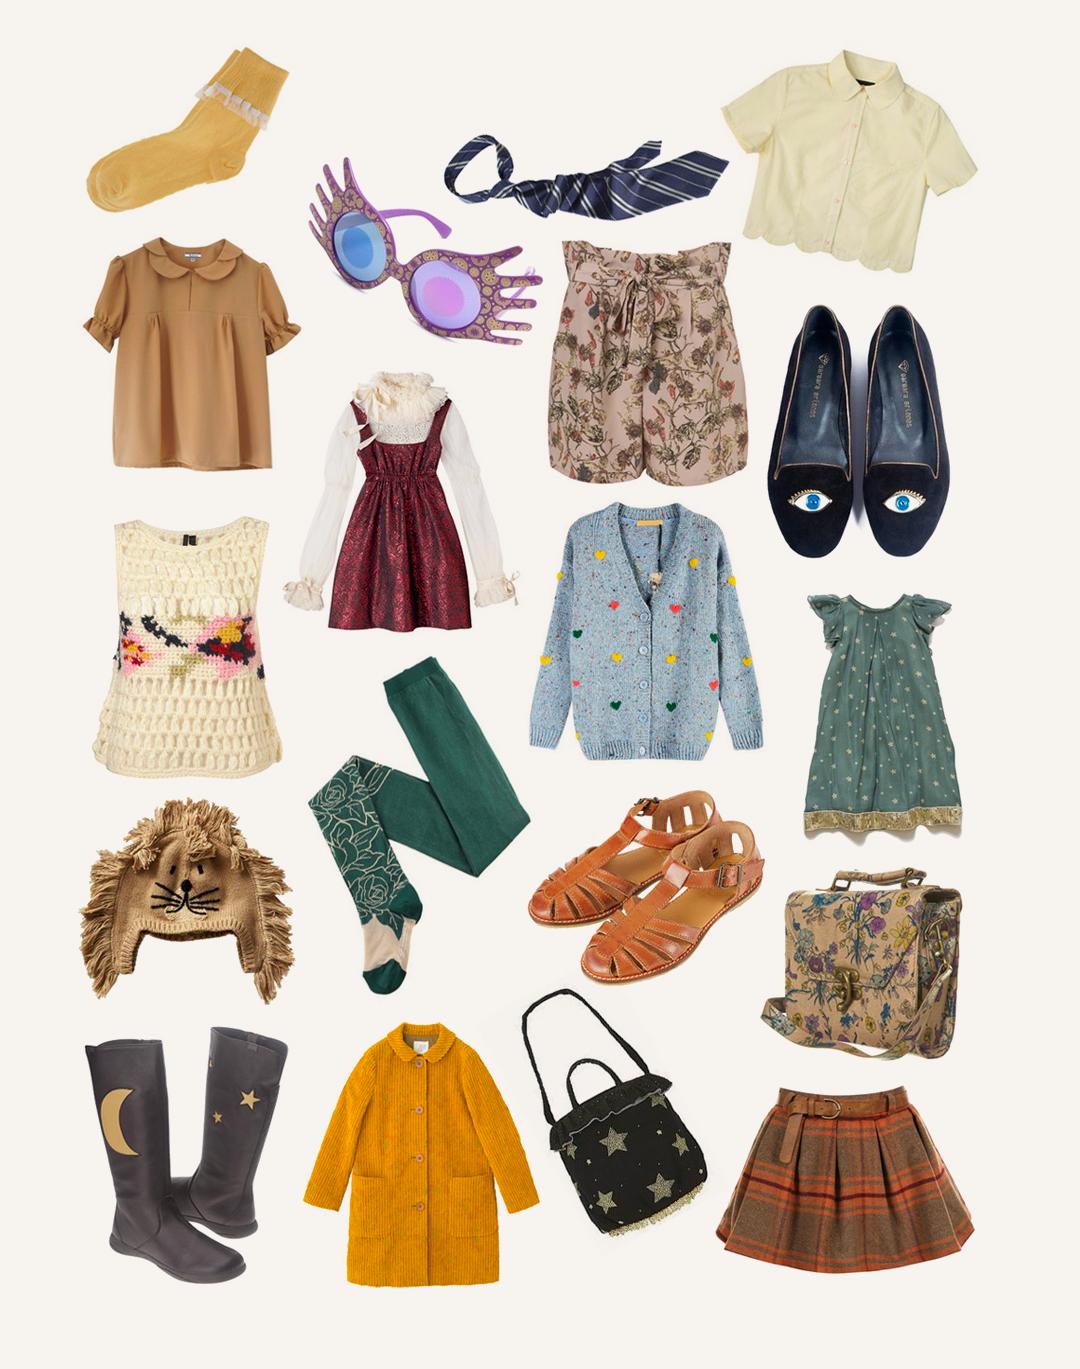 hp-wardrobe-luna.jpg